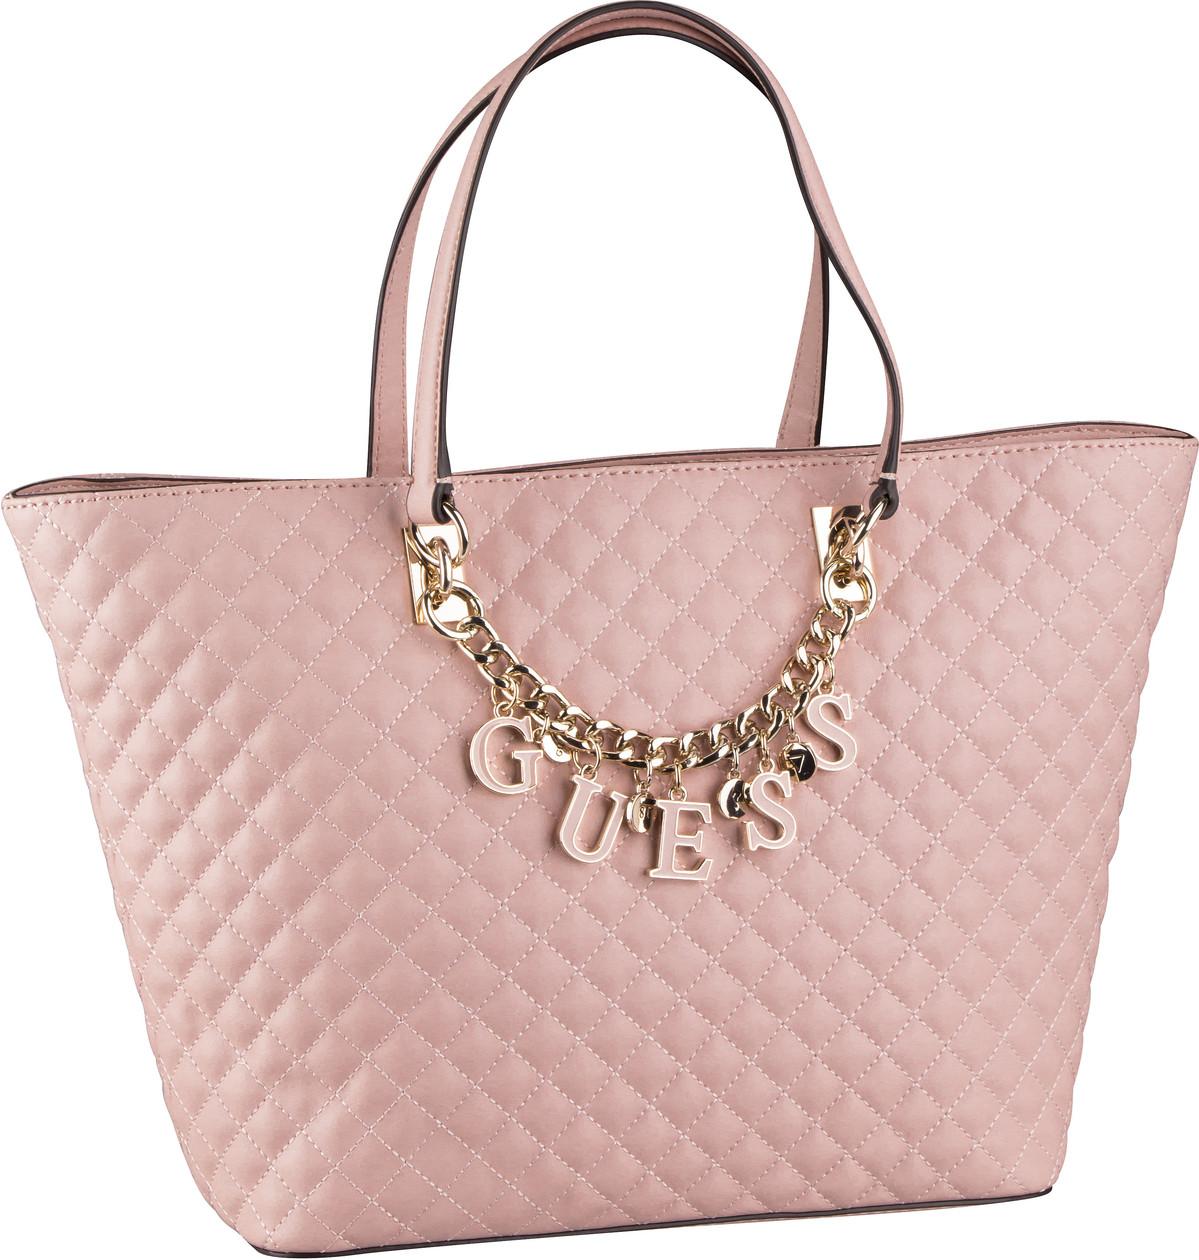 Handtasche Passion Tote Blush